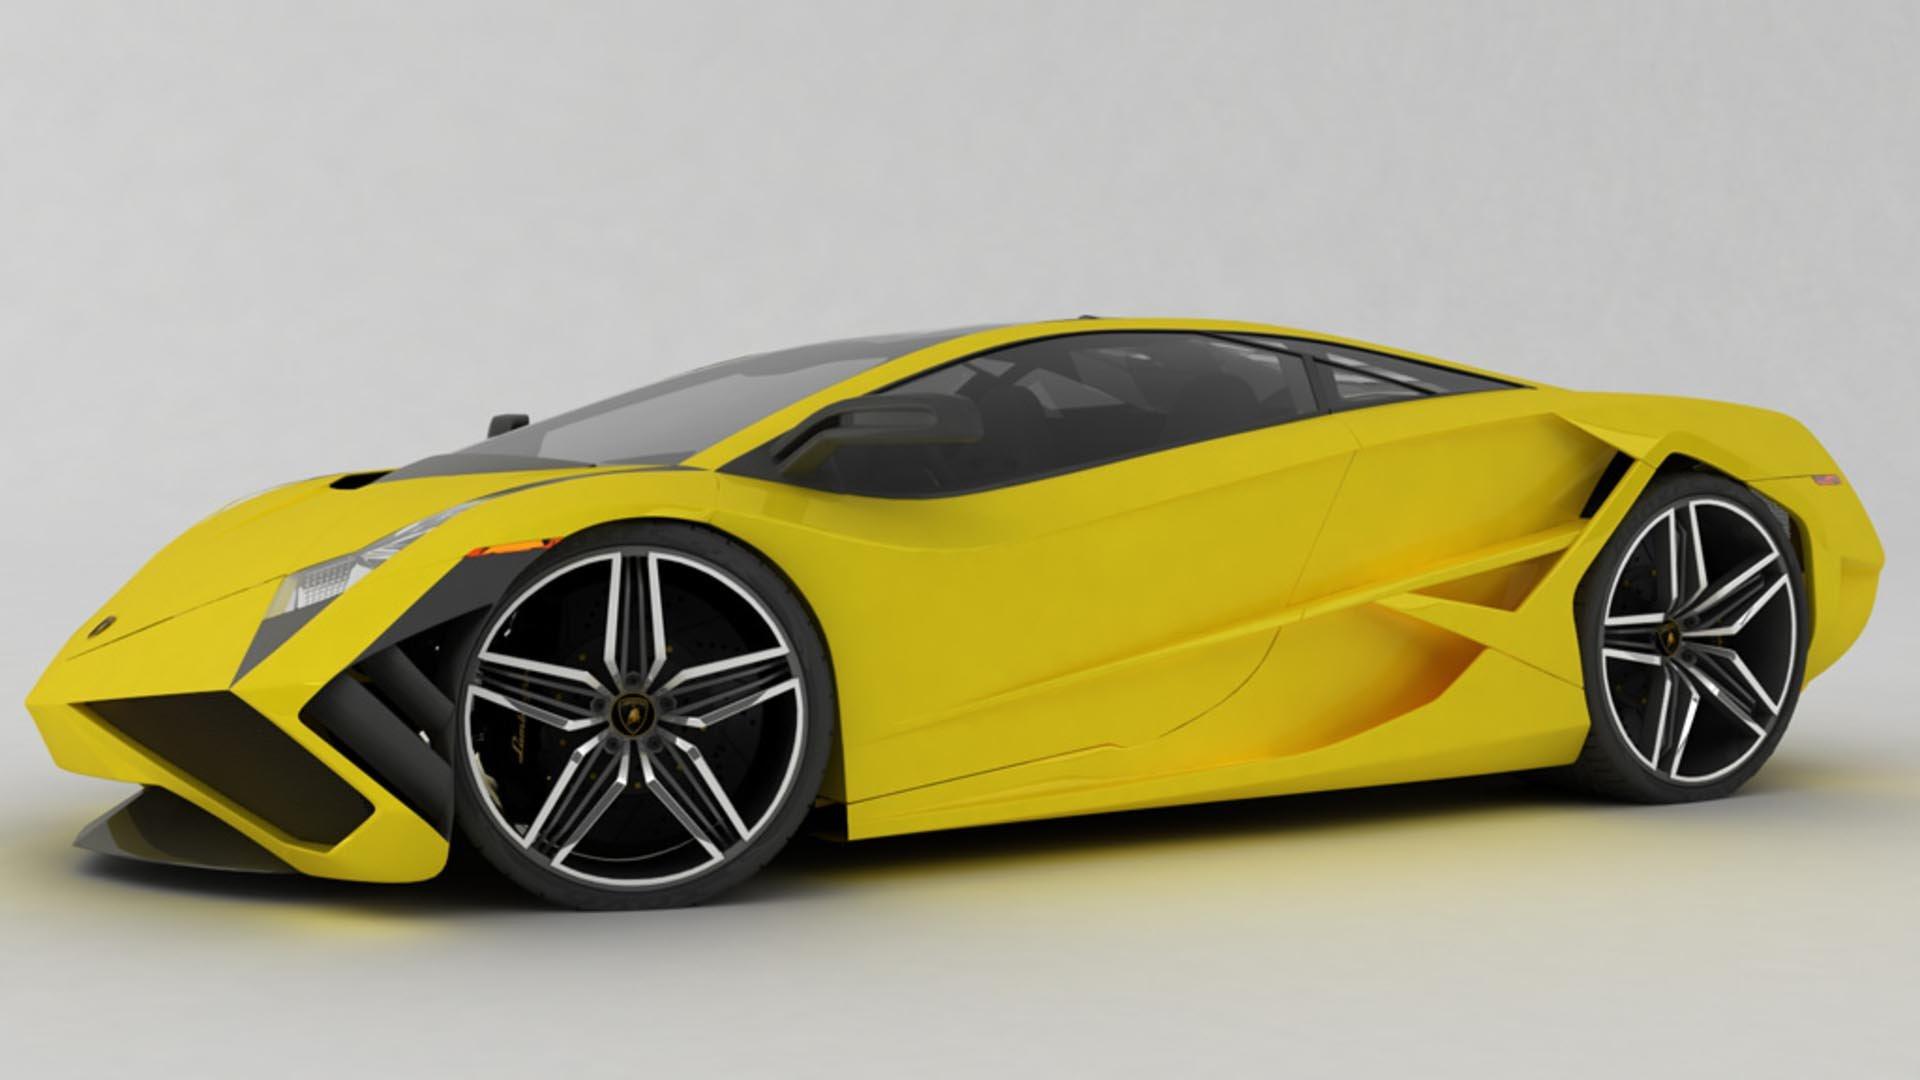 download Lamborghini Concept Pictures and Photos